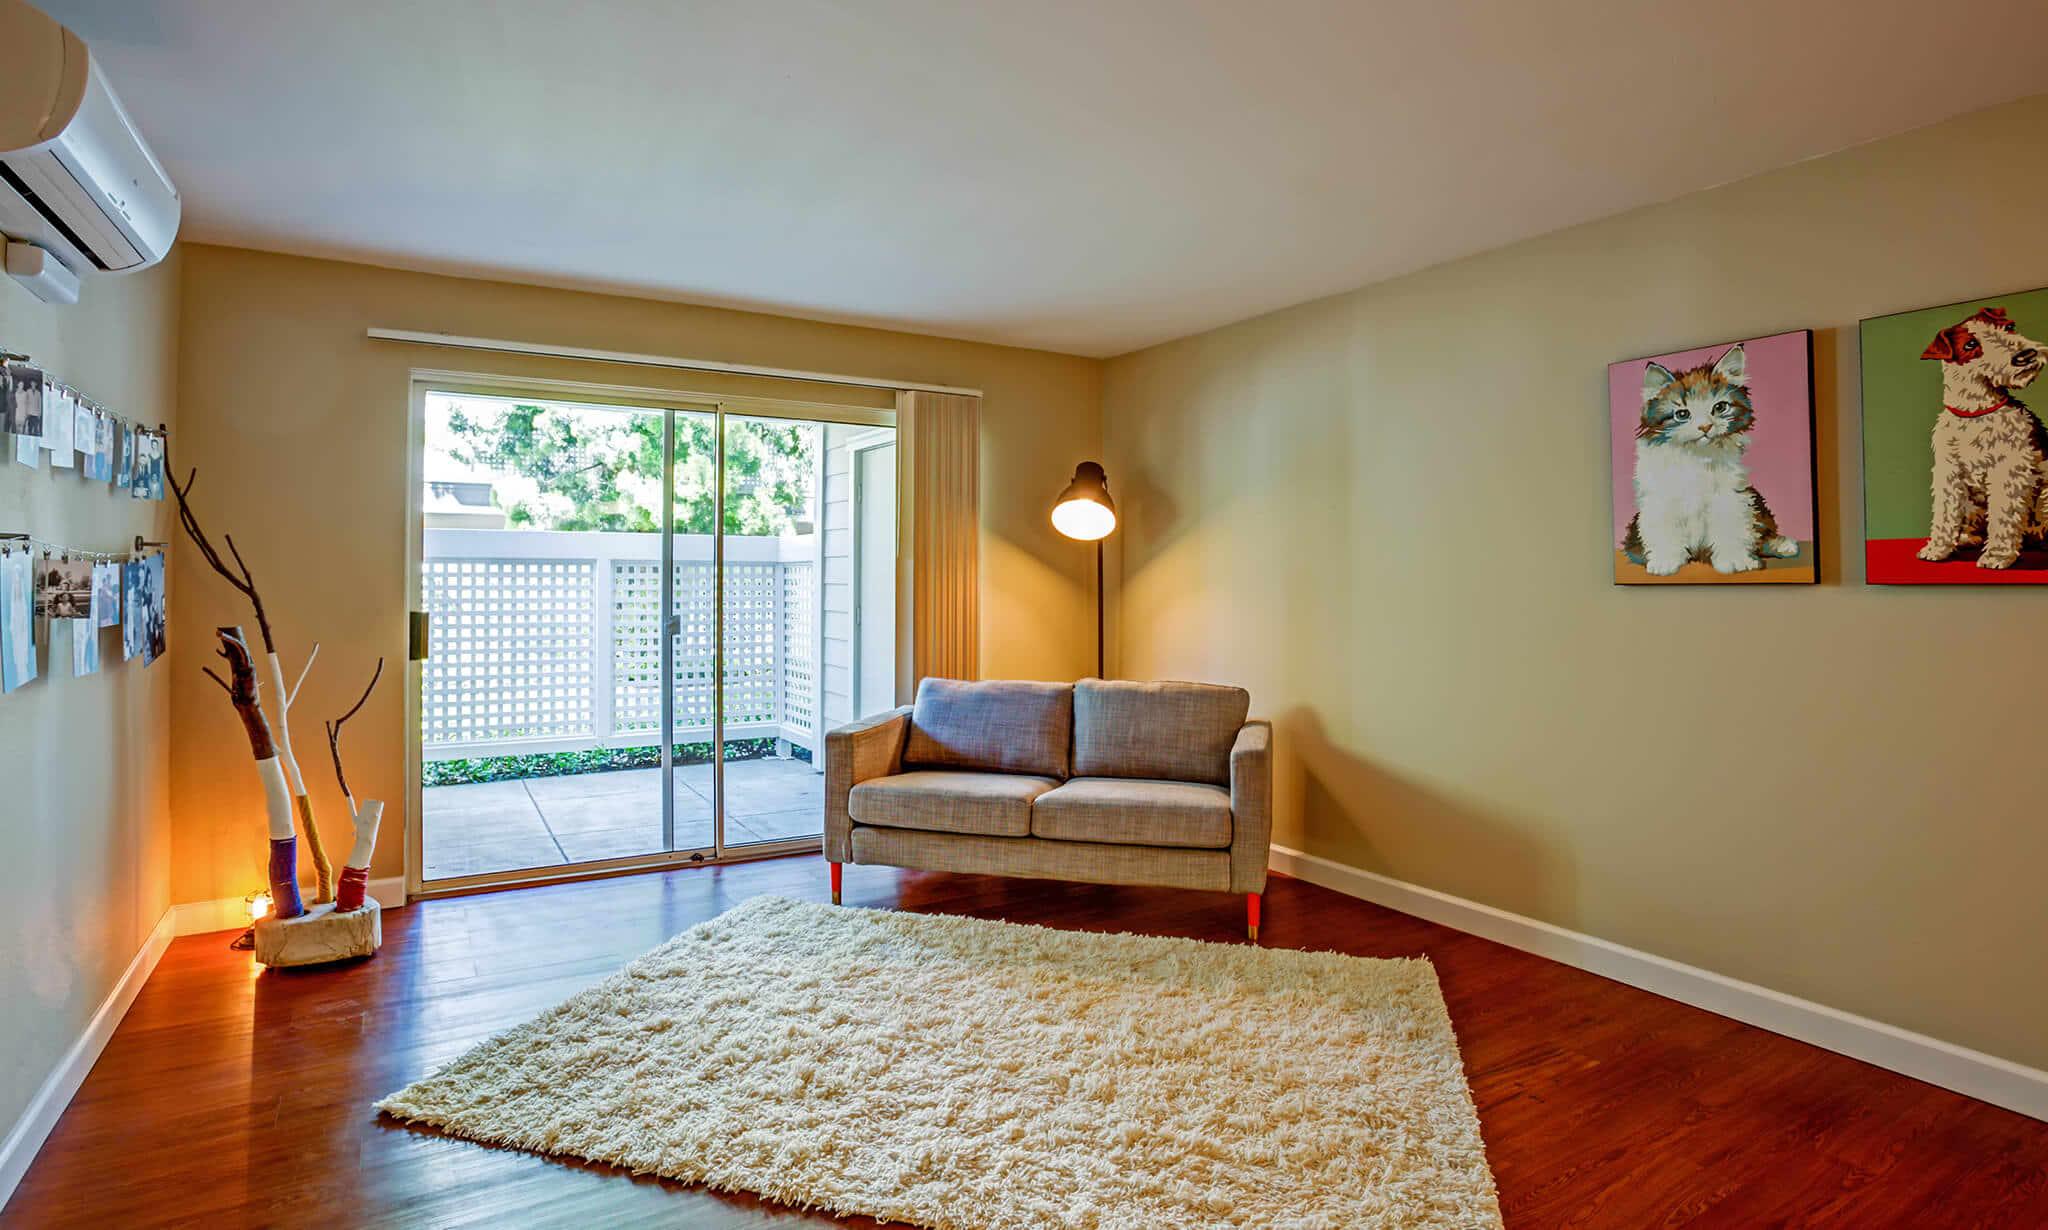 Timberleaf Apartments apartments in Santa Clara CA to rent photo 11